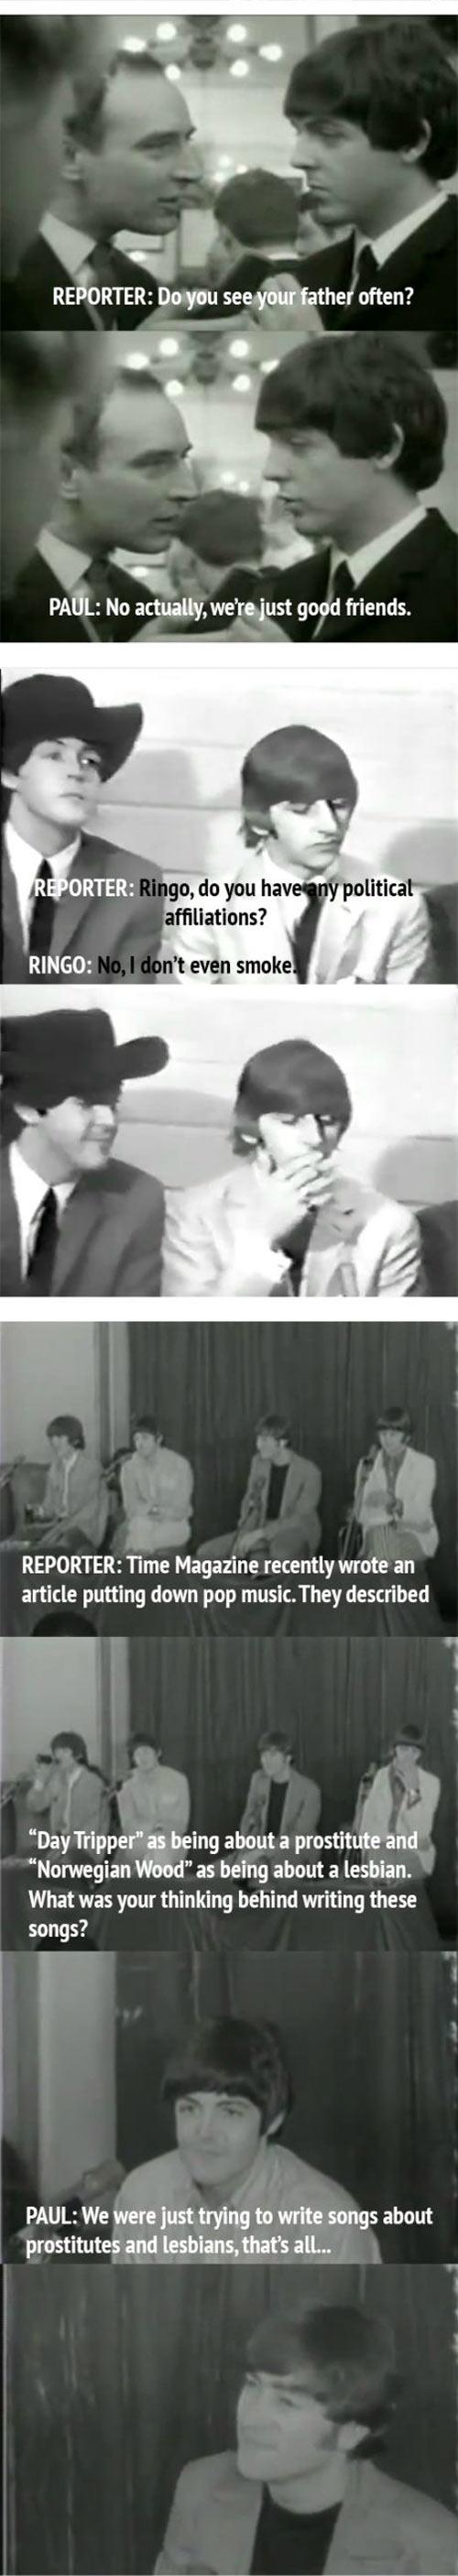 funny-Beatles-reporter-John-perfect-girl